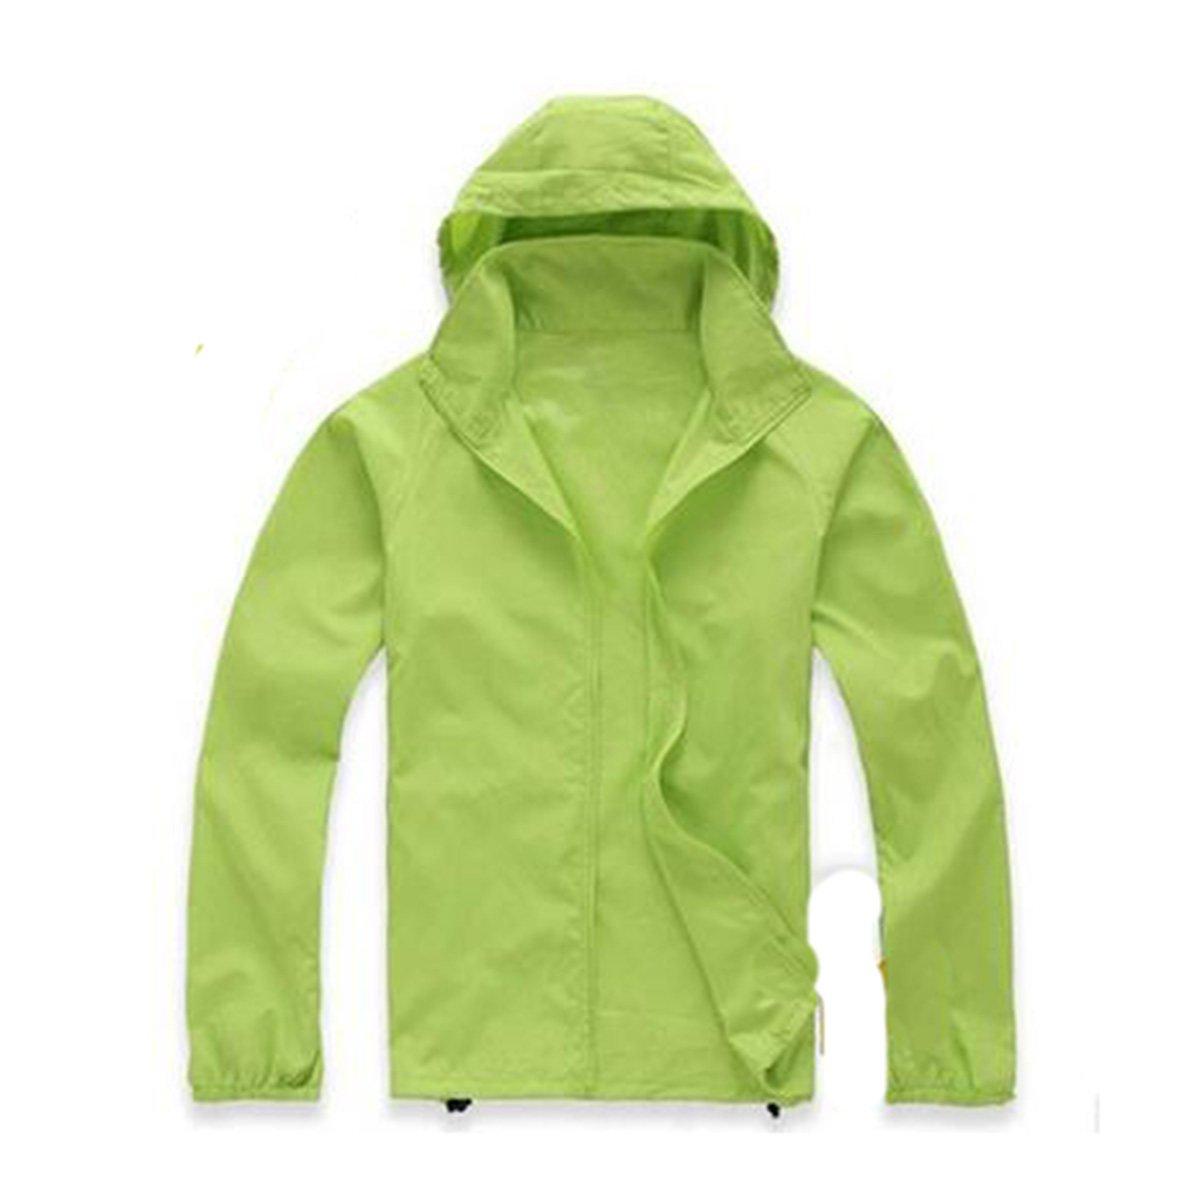 Shuang Yu Zuo Outdoor Skin Kleidung Dünne Sektion Sonnenschutz Wasserdichte Hooded Windbreaker Overalls